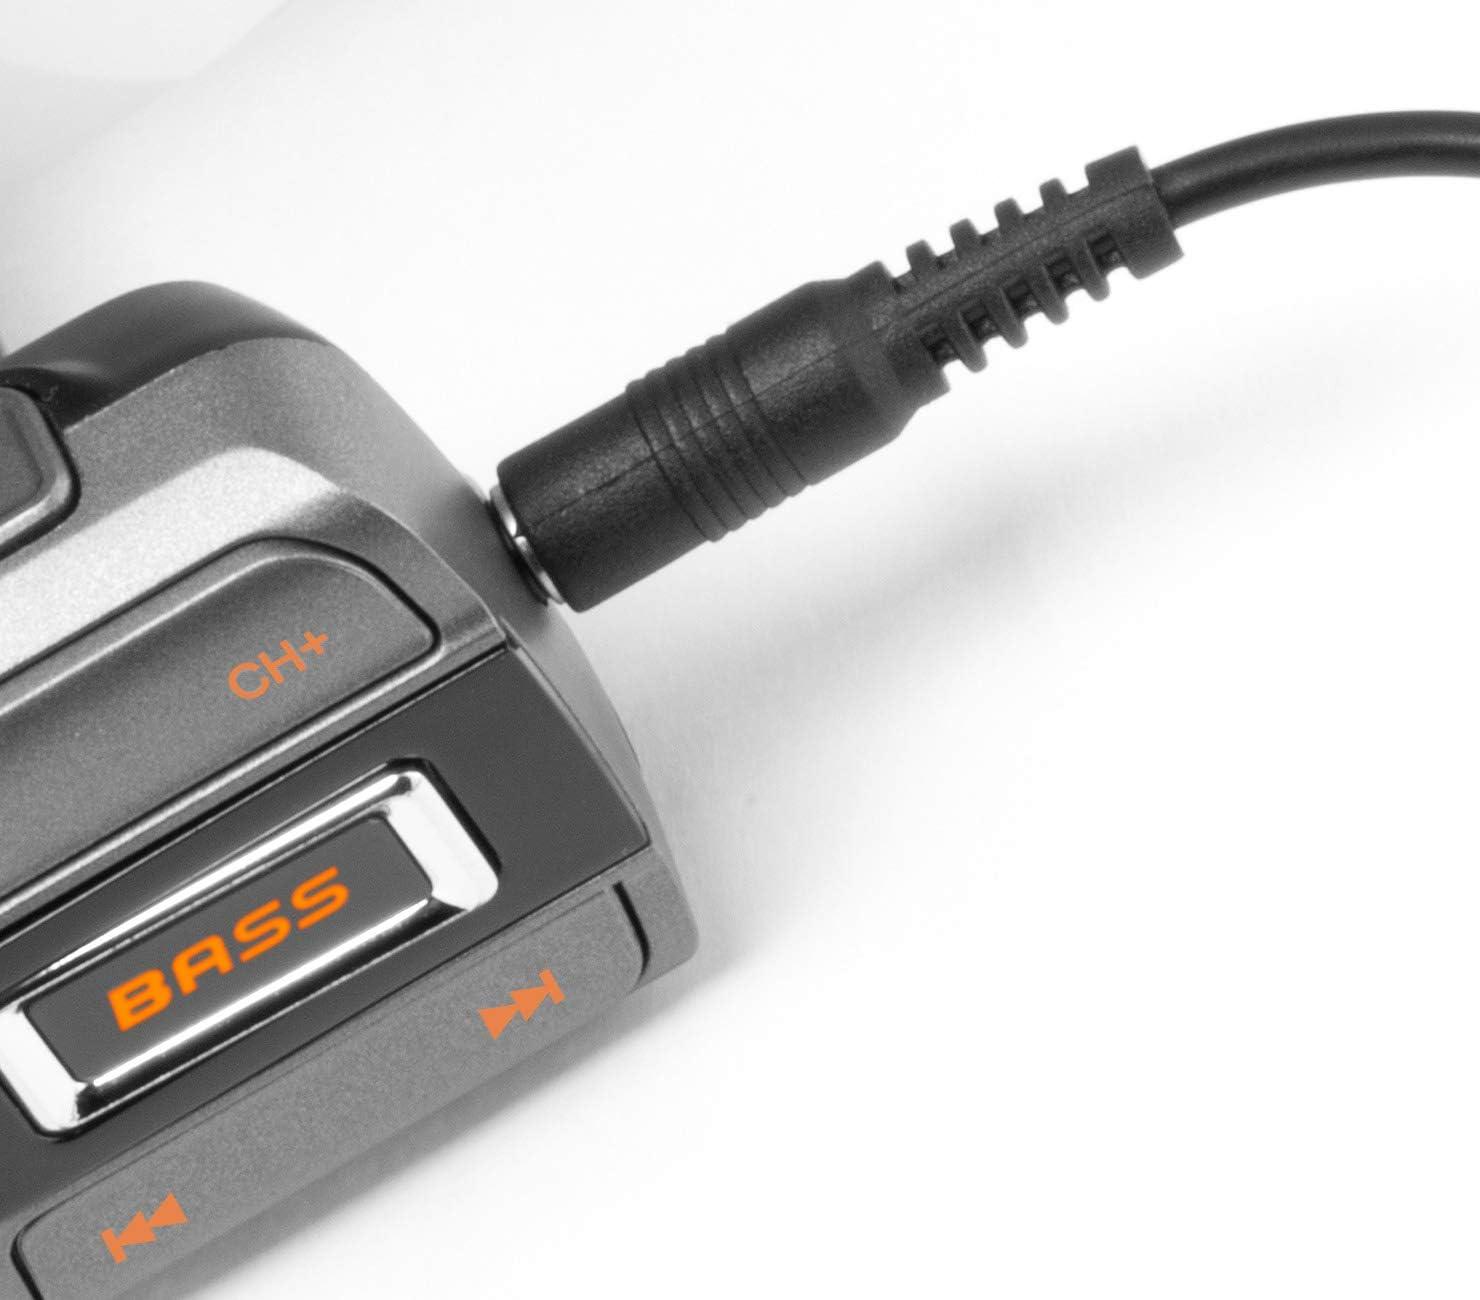 Technaxx Fmt1350bt Transmitter Bass Booster Audio Streaming Bassverstärkungstaste Musik Auto Bluetooth Usb Mikrofon Schnelladefunktion Qc3 0 Microsd Freisprecheinrichtung Navigation